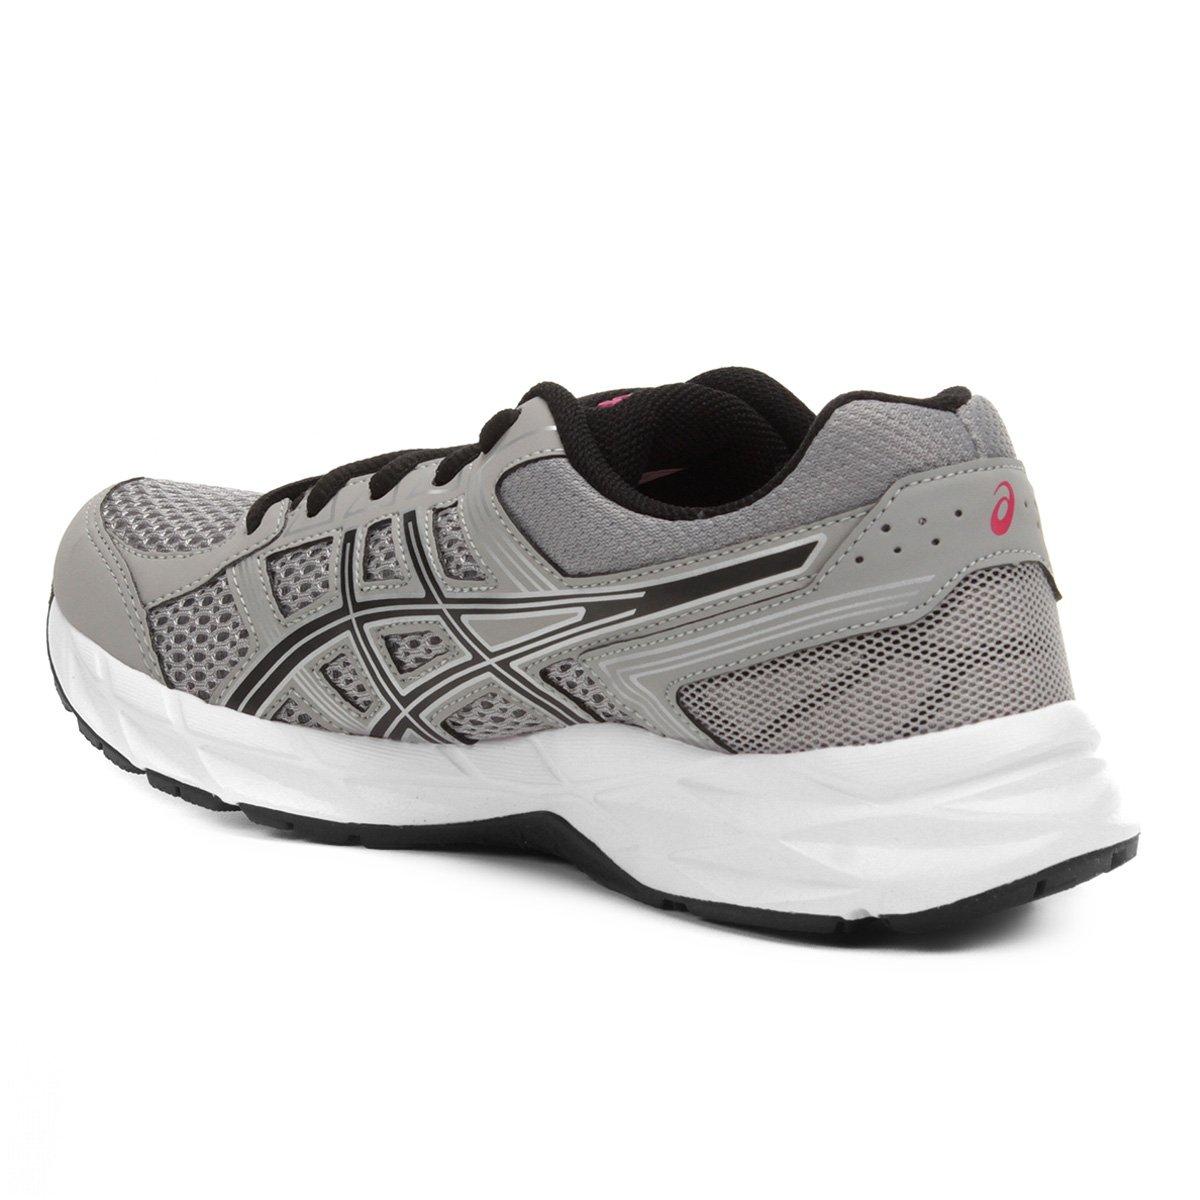 8501a7a815 Tênis Asics Gel Contend 4 A Feminino - Tam: 37 - Shopping TudoAzul